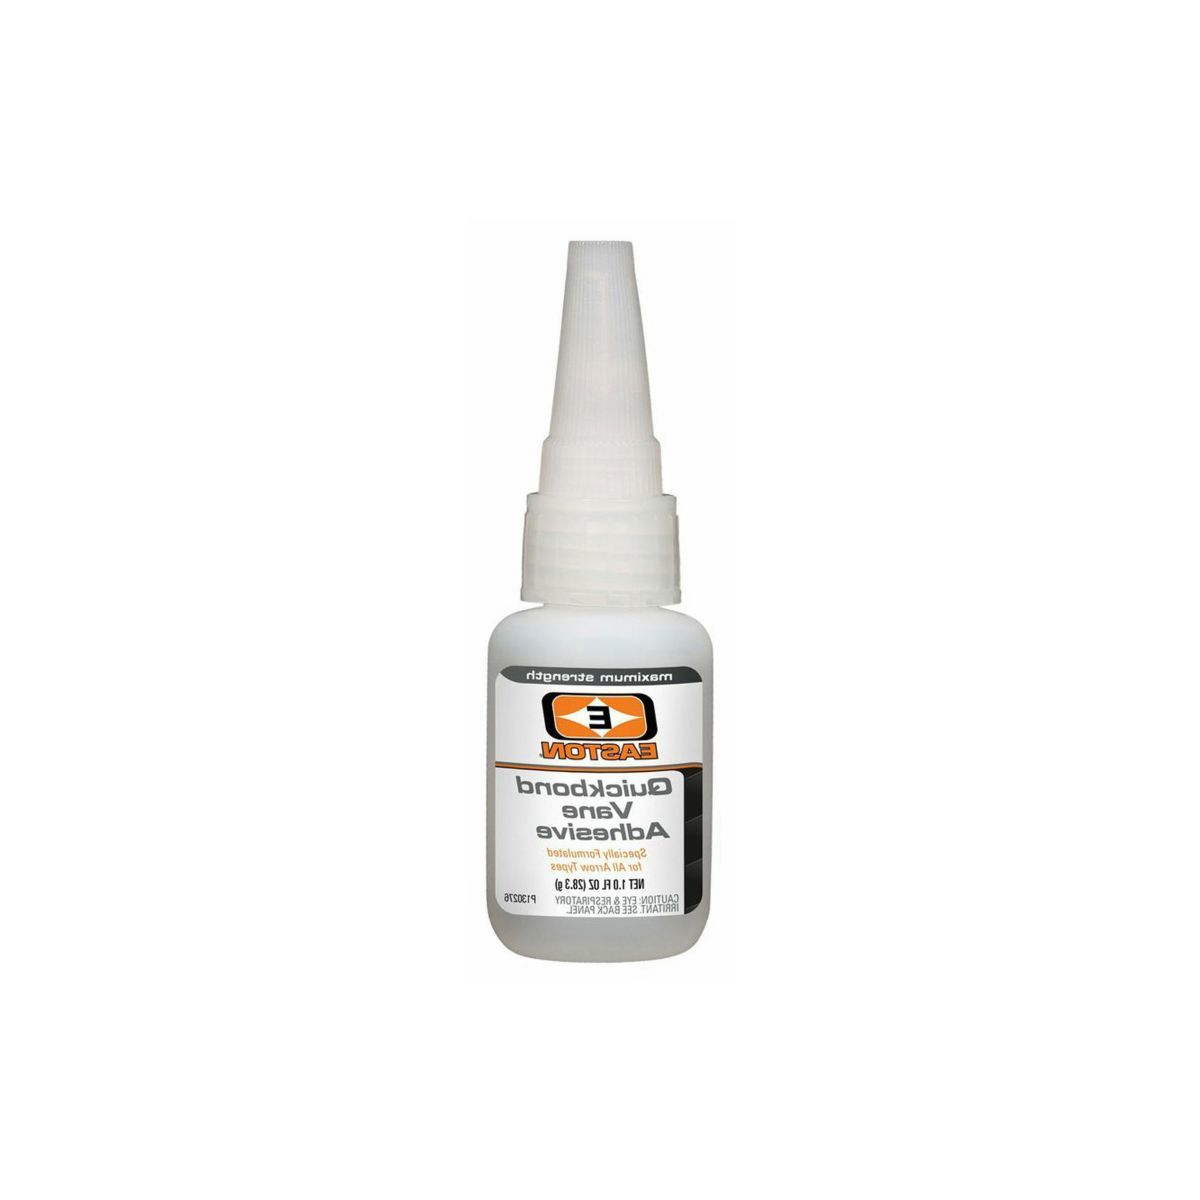 Easton® Dr. Dougs' Quick Bond Vane Adhesive